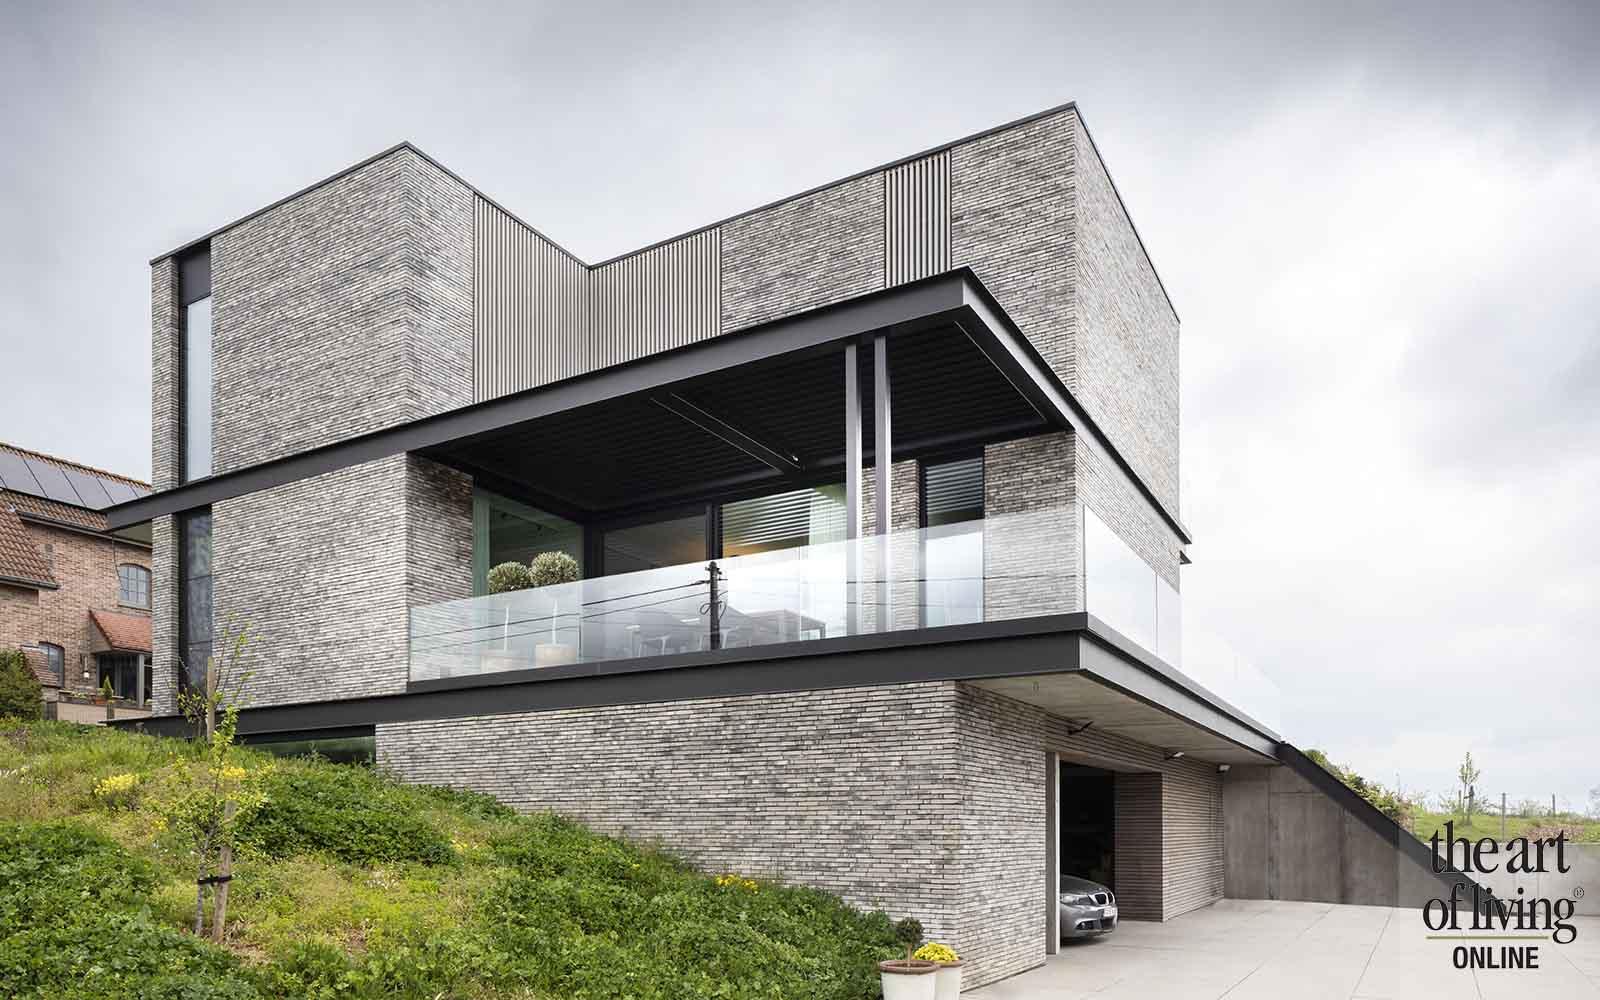 licht interieur_OH Architecten, the art of living